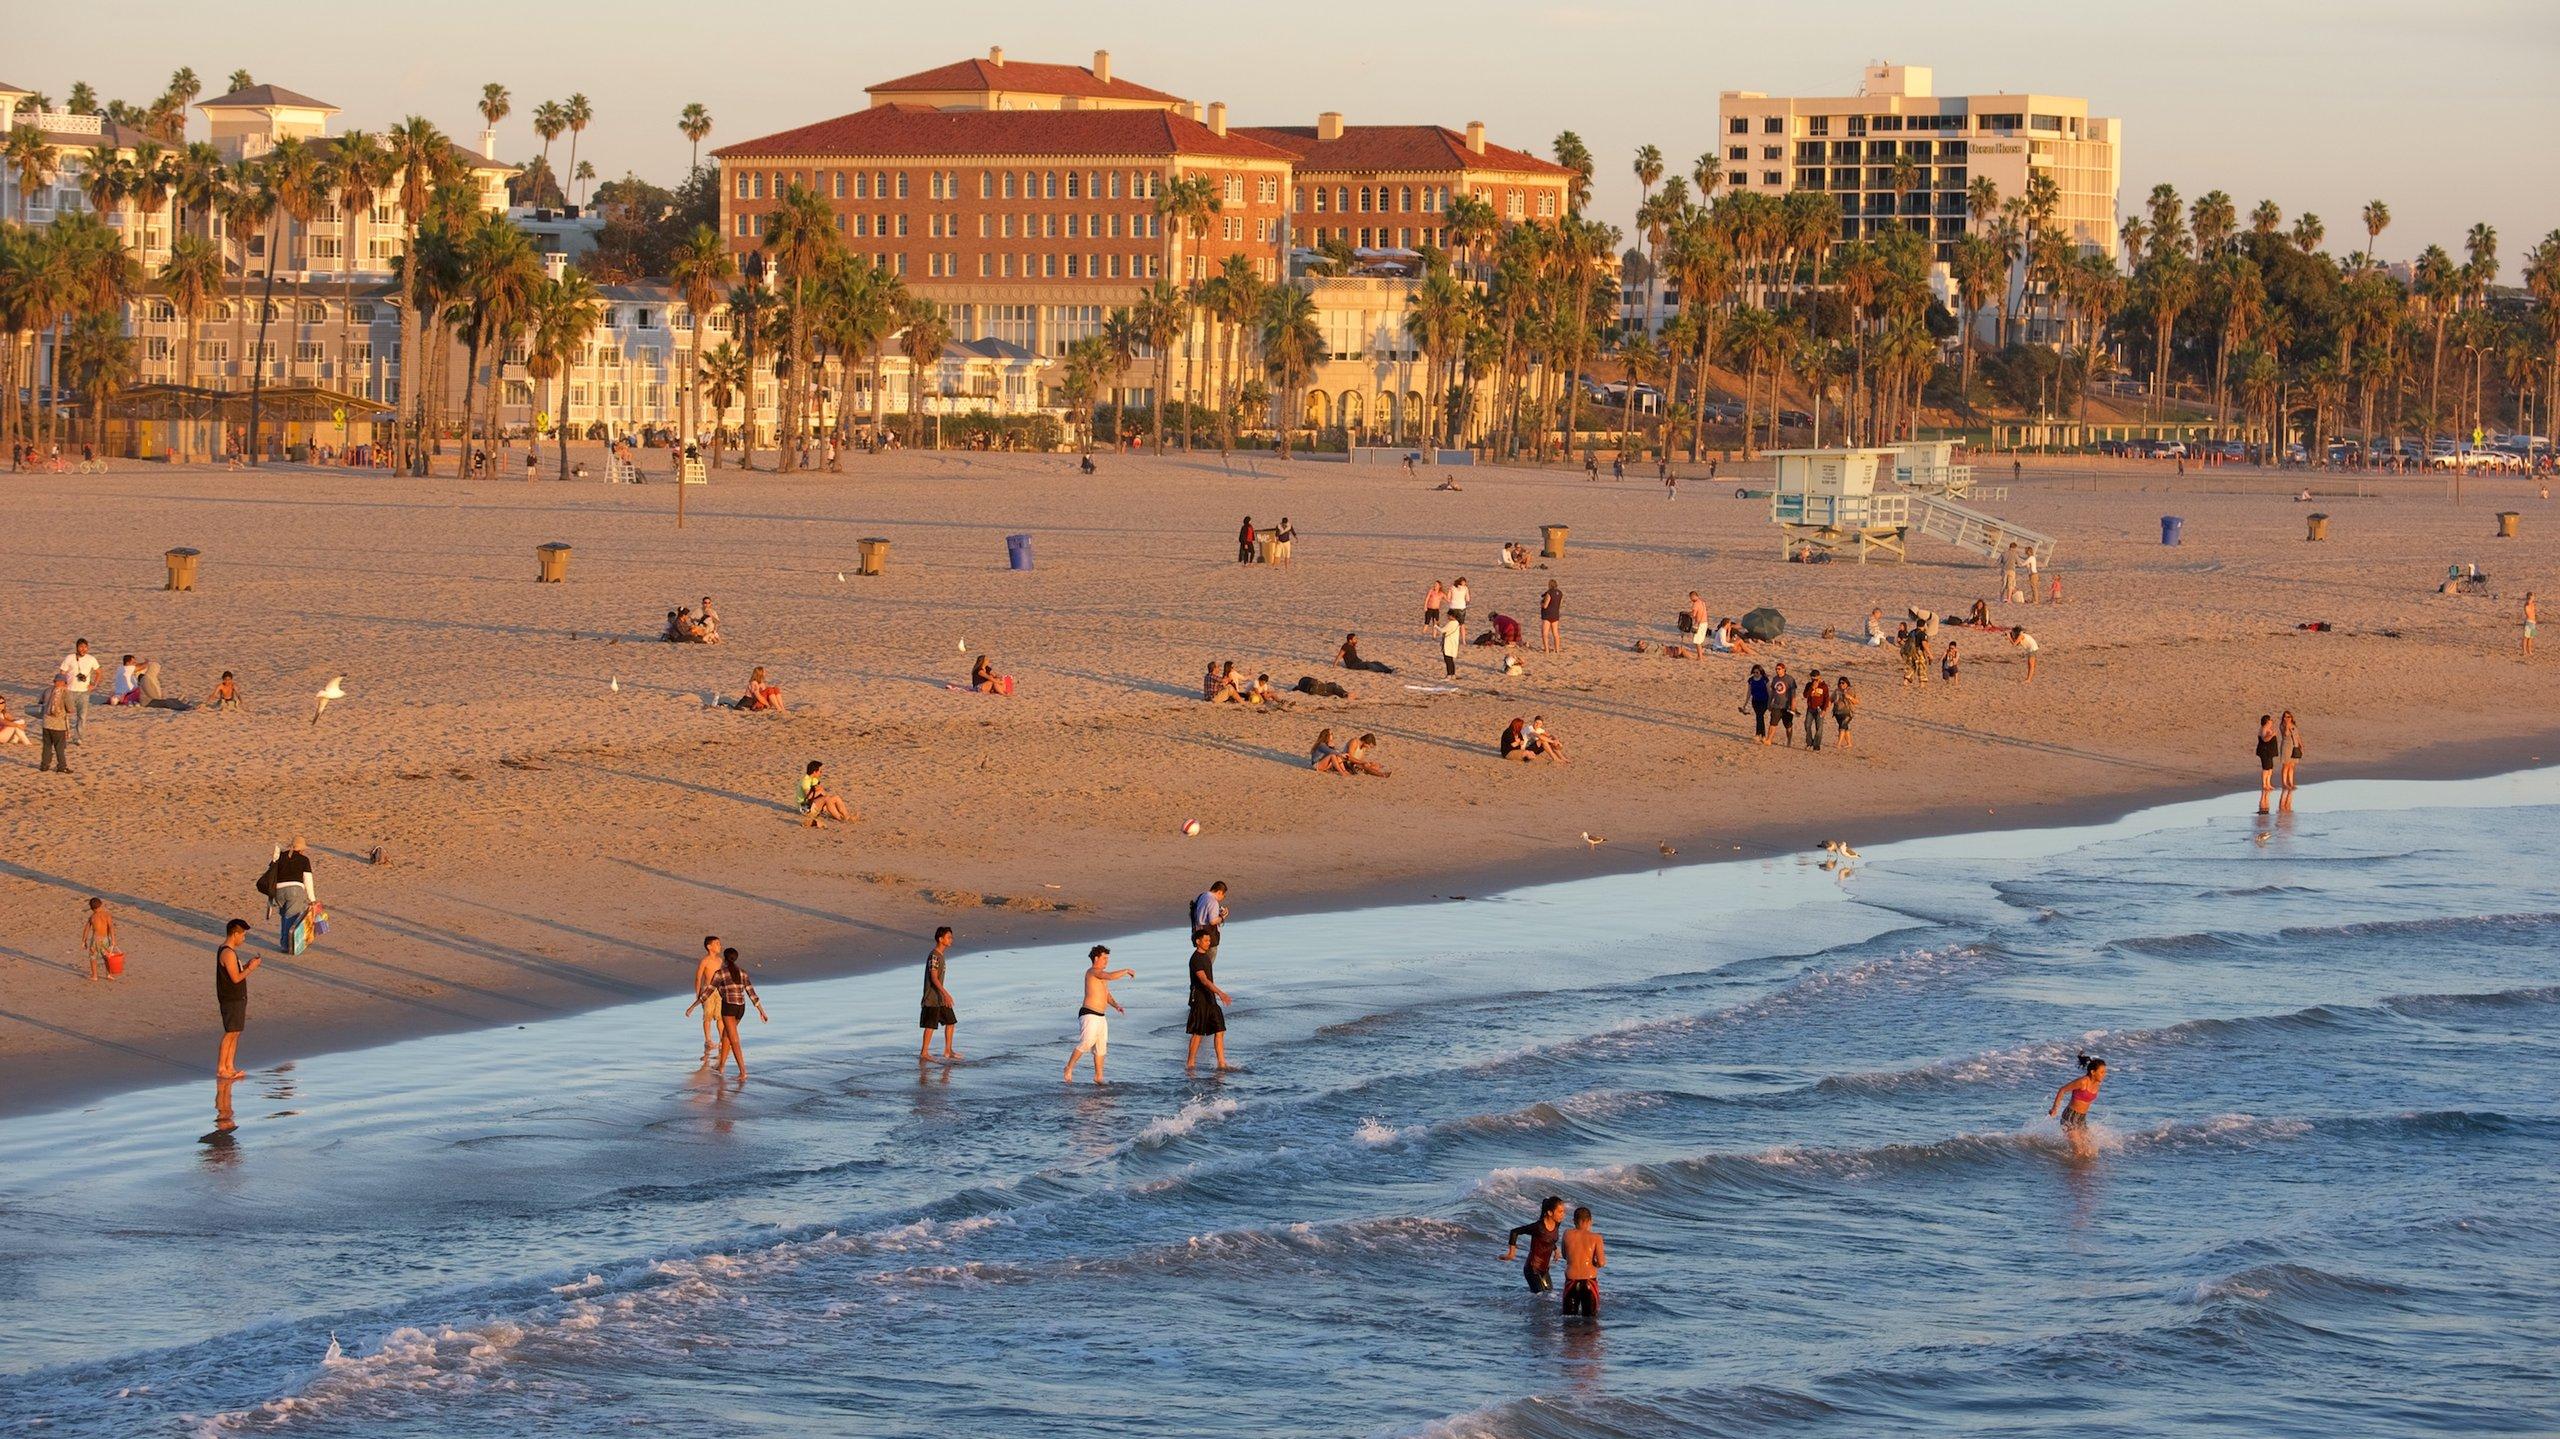 Santa Monica Beach, Santa Monica, California, Stati Uniti d'America